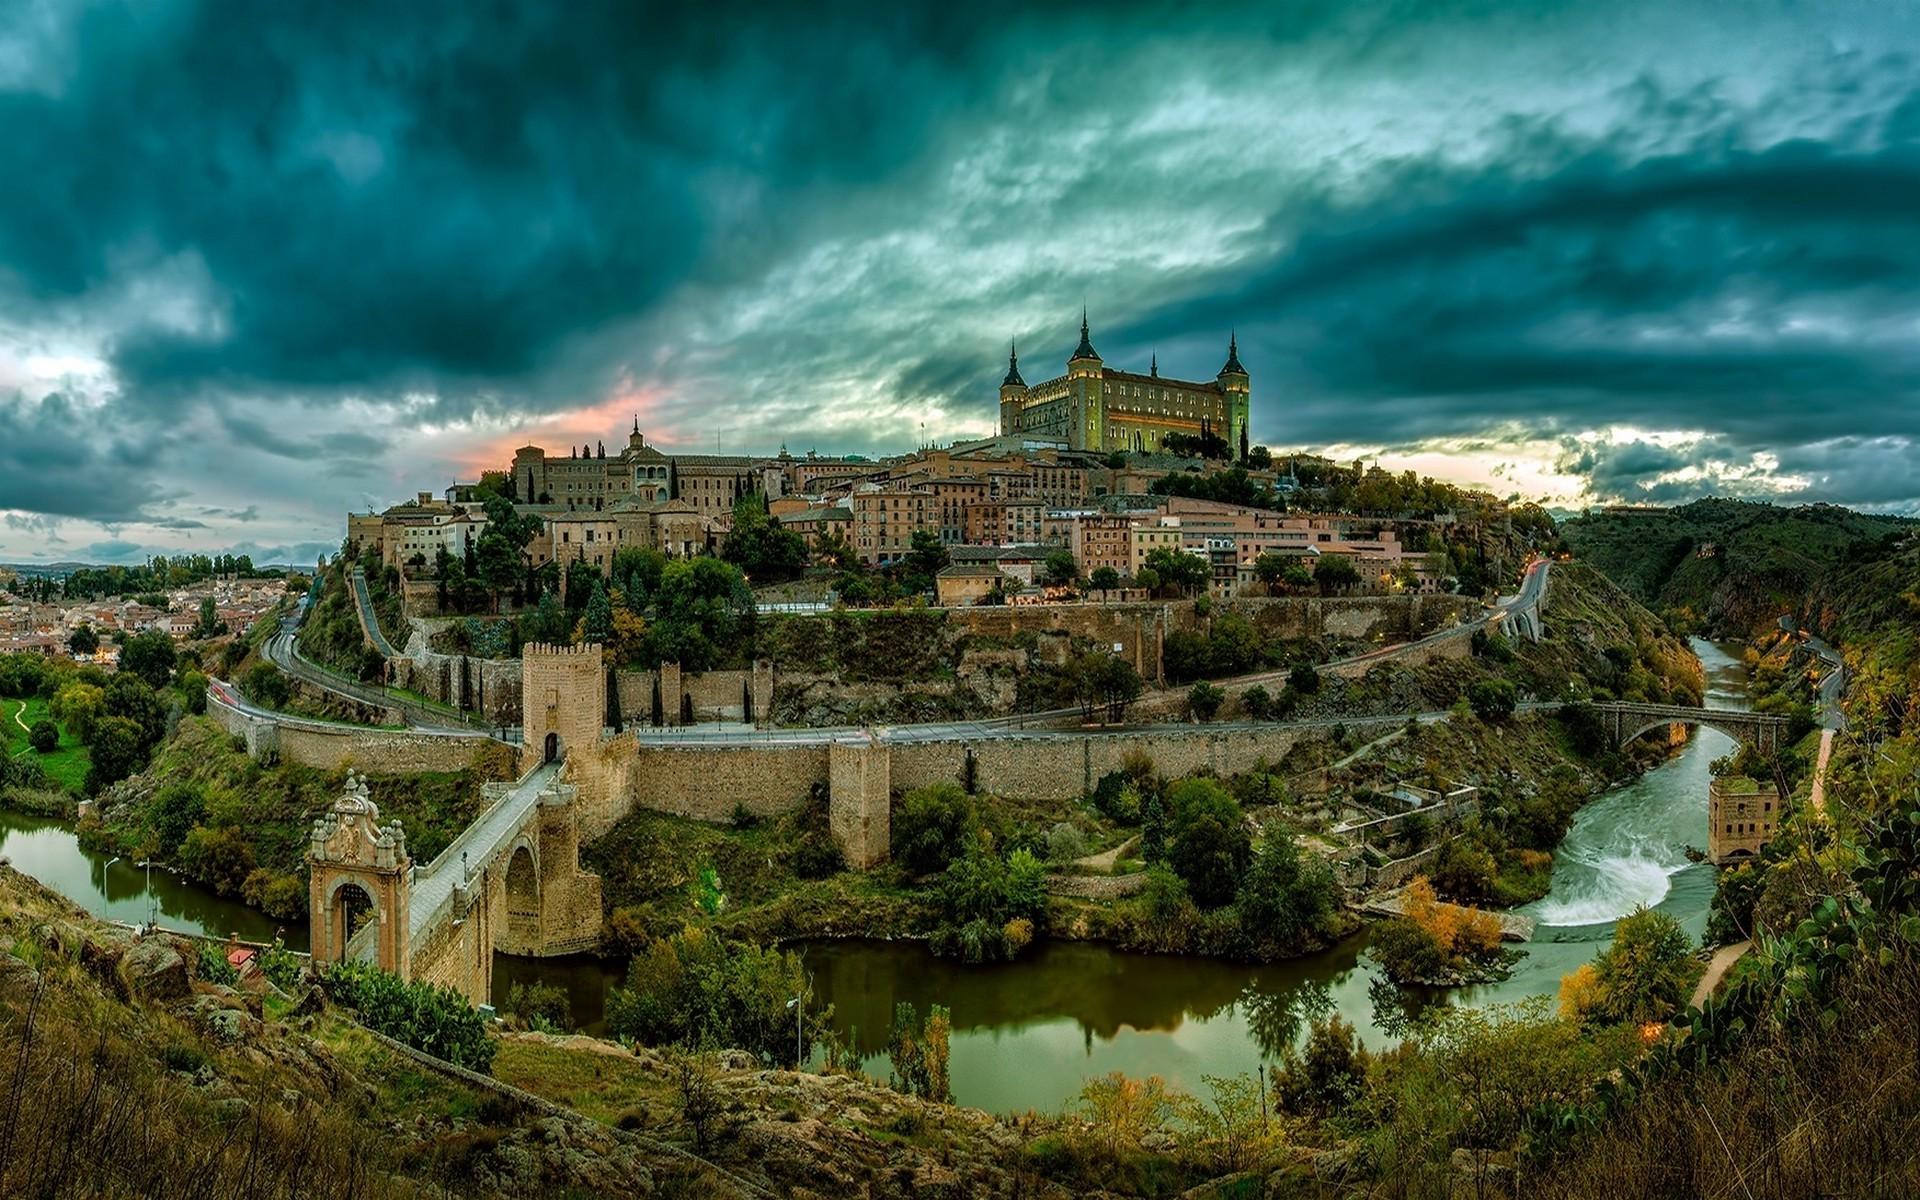 Toledo: Bridge, River, Mountain, City, Landscape, Castle, Tree, Green, Building, Man Made, Spain, Road, House, Toledo